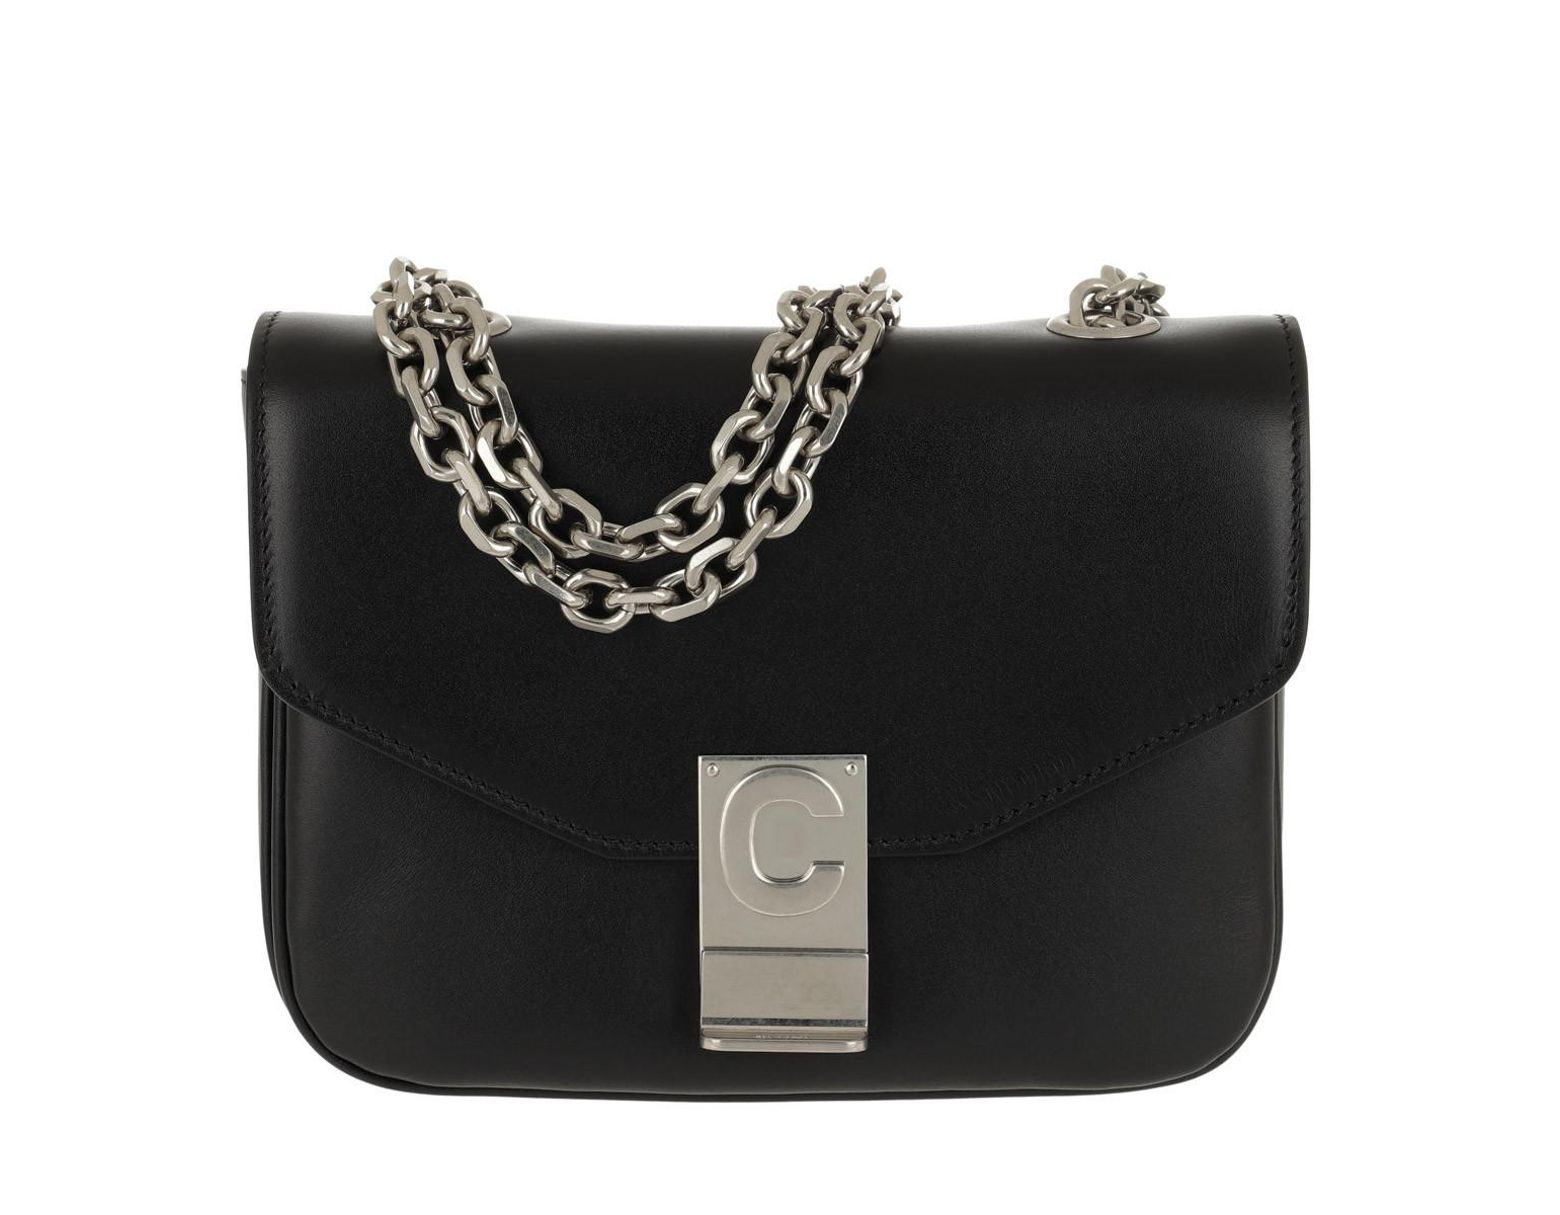 caef34d9 Céline C Bag Small Shiny Calfskin Black in Black - Lyst